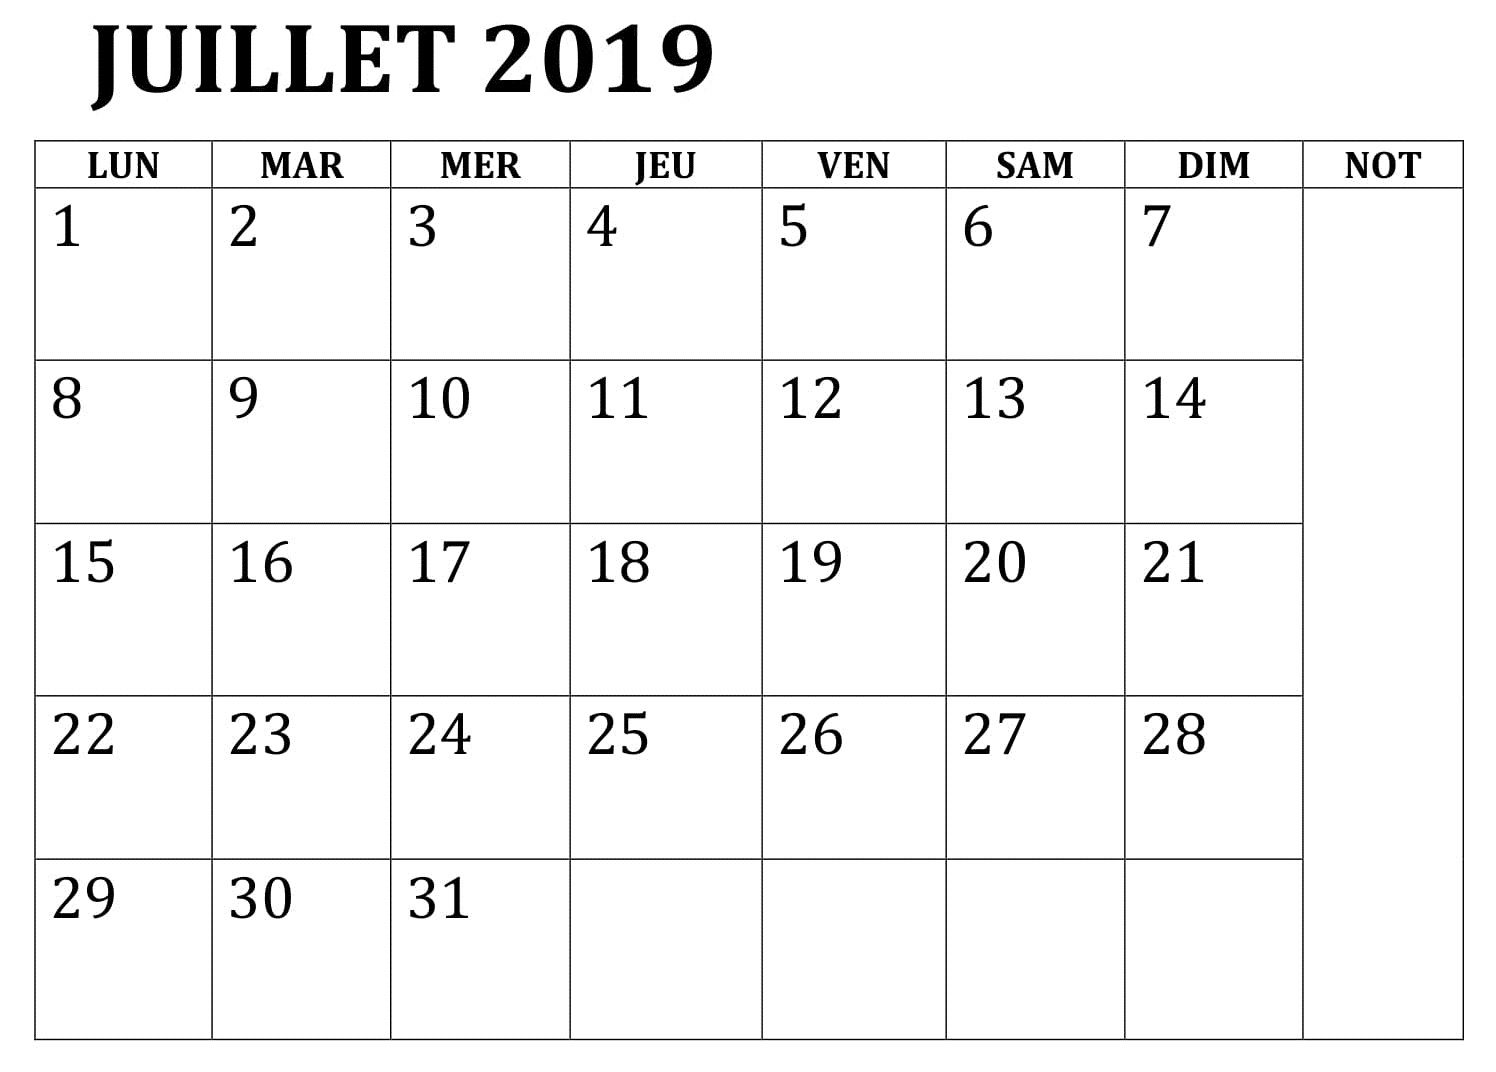 Template Calendrier 2019.Calendrier 2019 Juillet A Imprimer Pdf In 2019 Blank